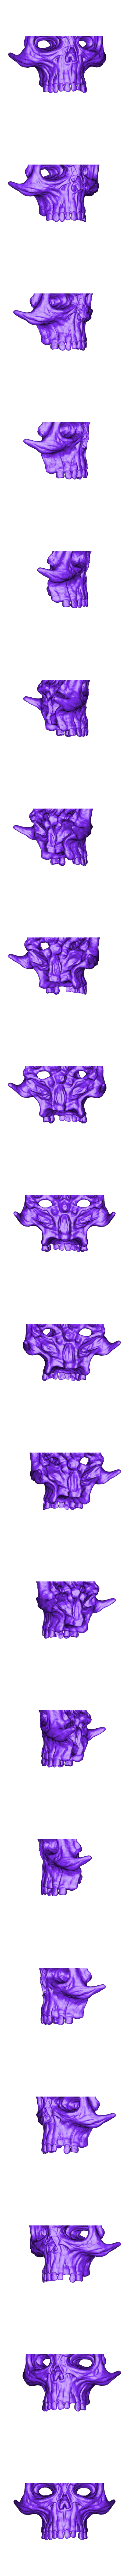 surturs-crown-skullbtm.stl Download free STL file Surtur crown (chopped into bits) • 3D printable object, durge990